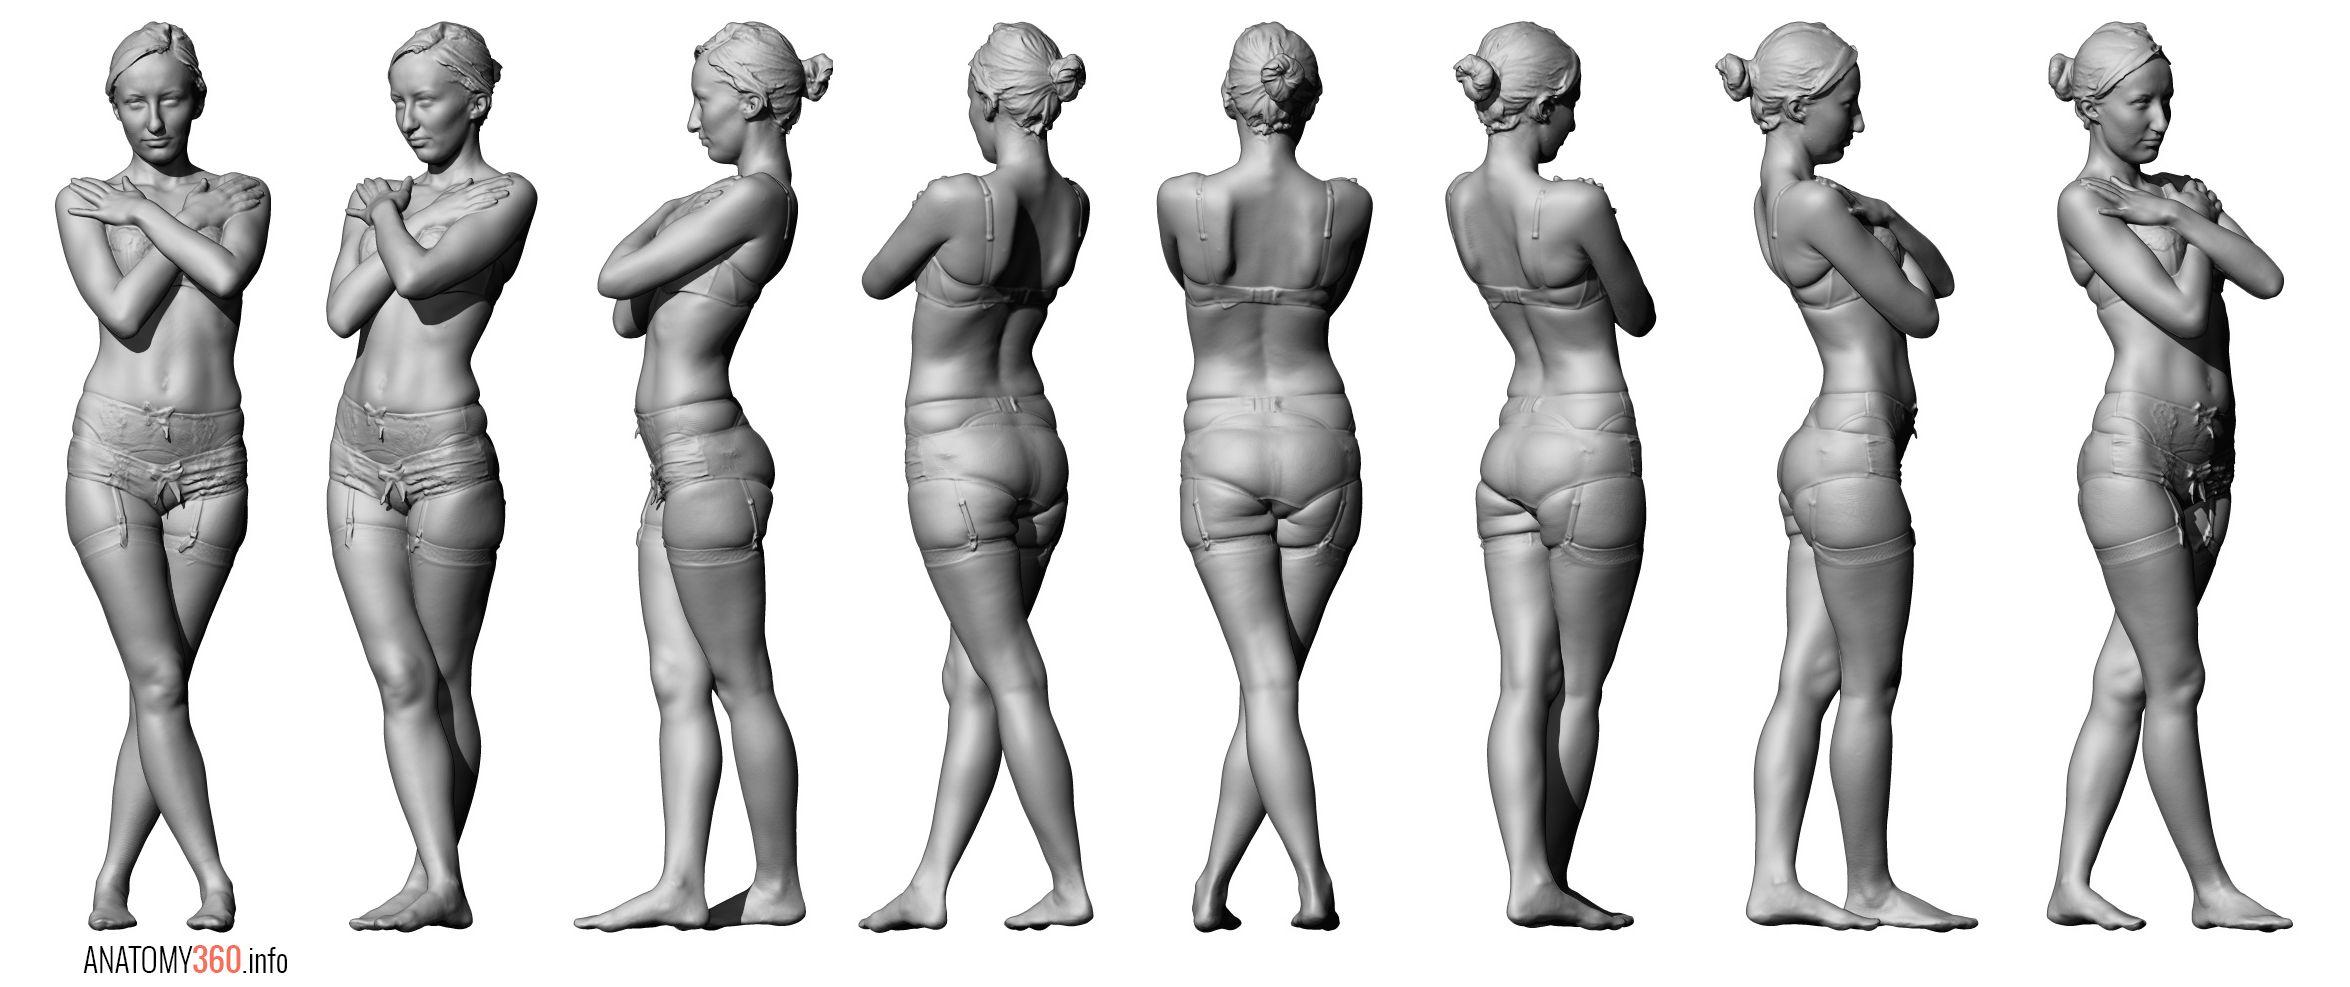 Fullbodyscanf03p0308 Anatomy 360 Pinterest Anatomy Pose And